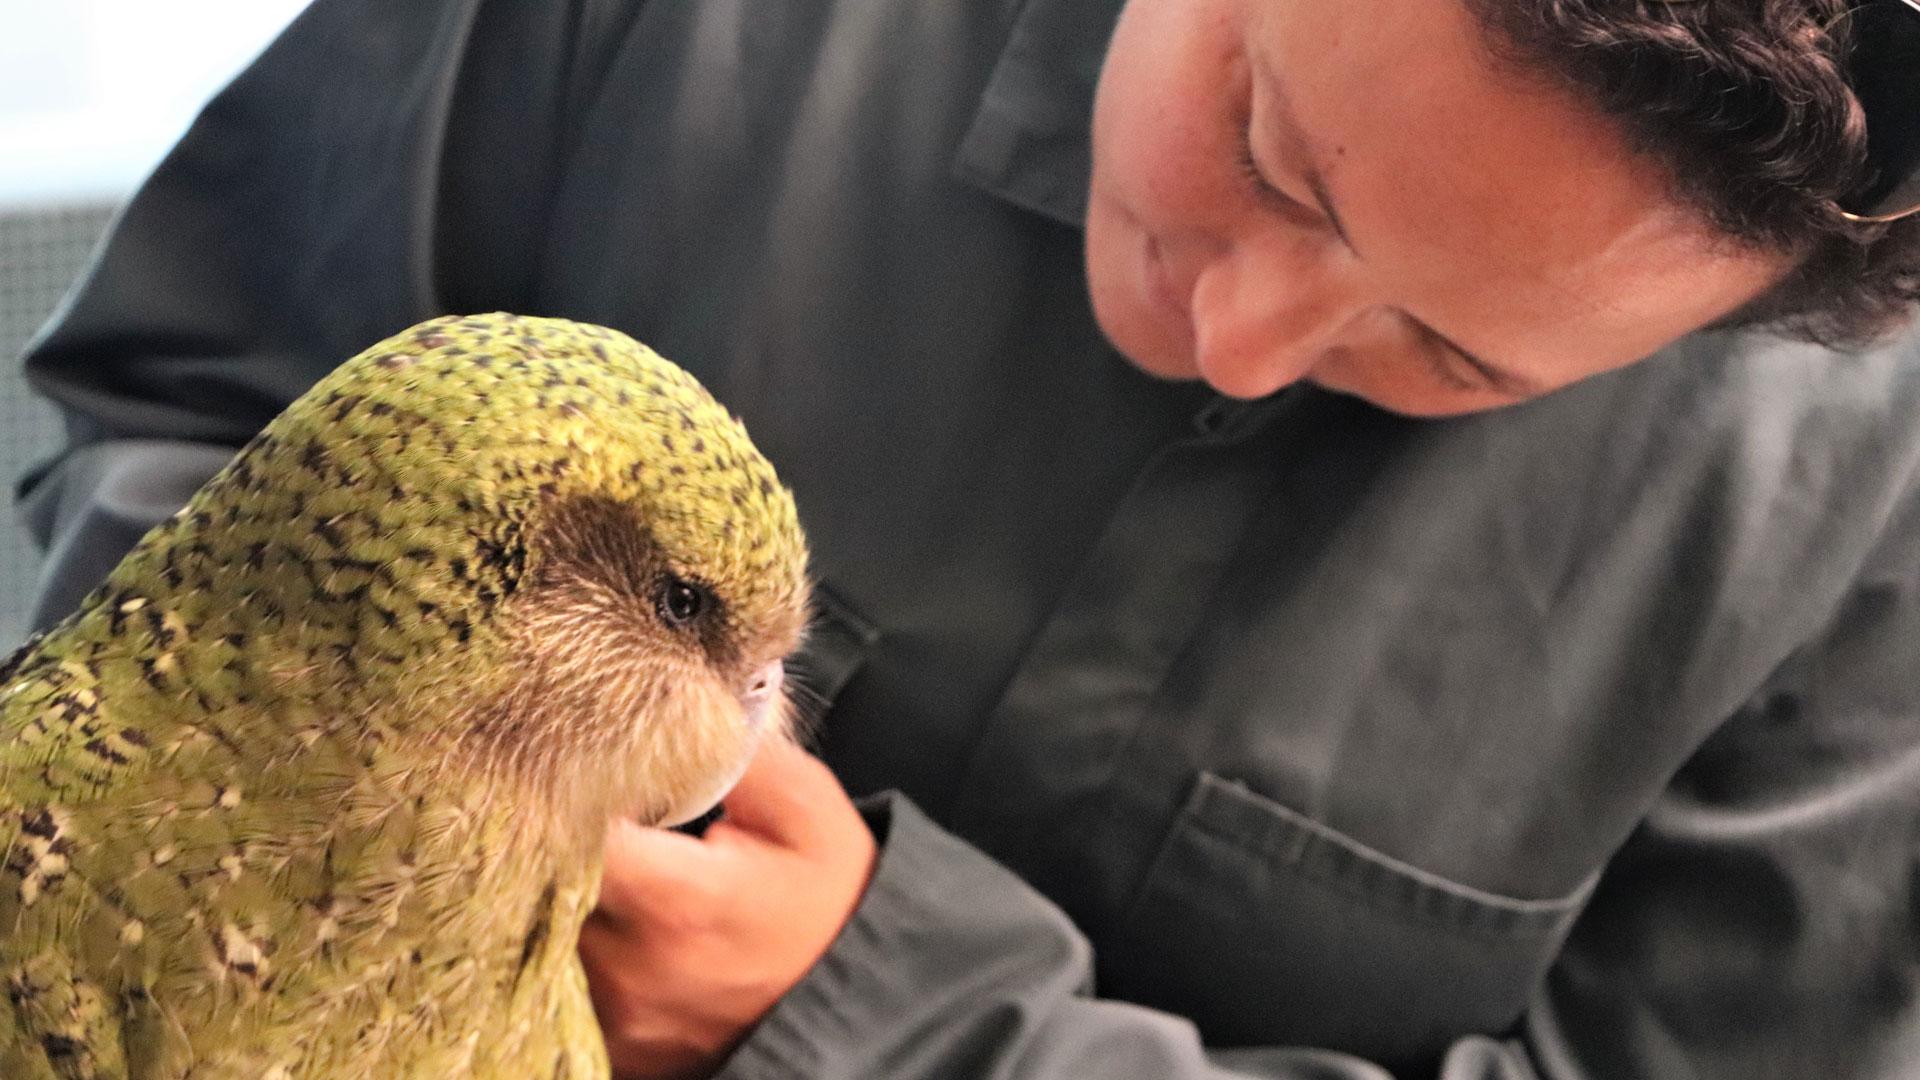 https://rfacdn.nz/zoo/assets/media/conservation-minister-gallery-3.jpg